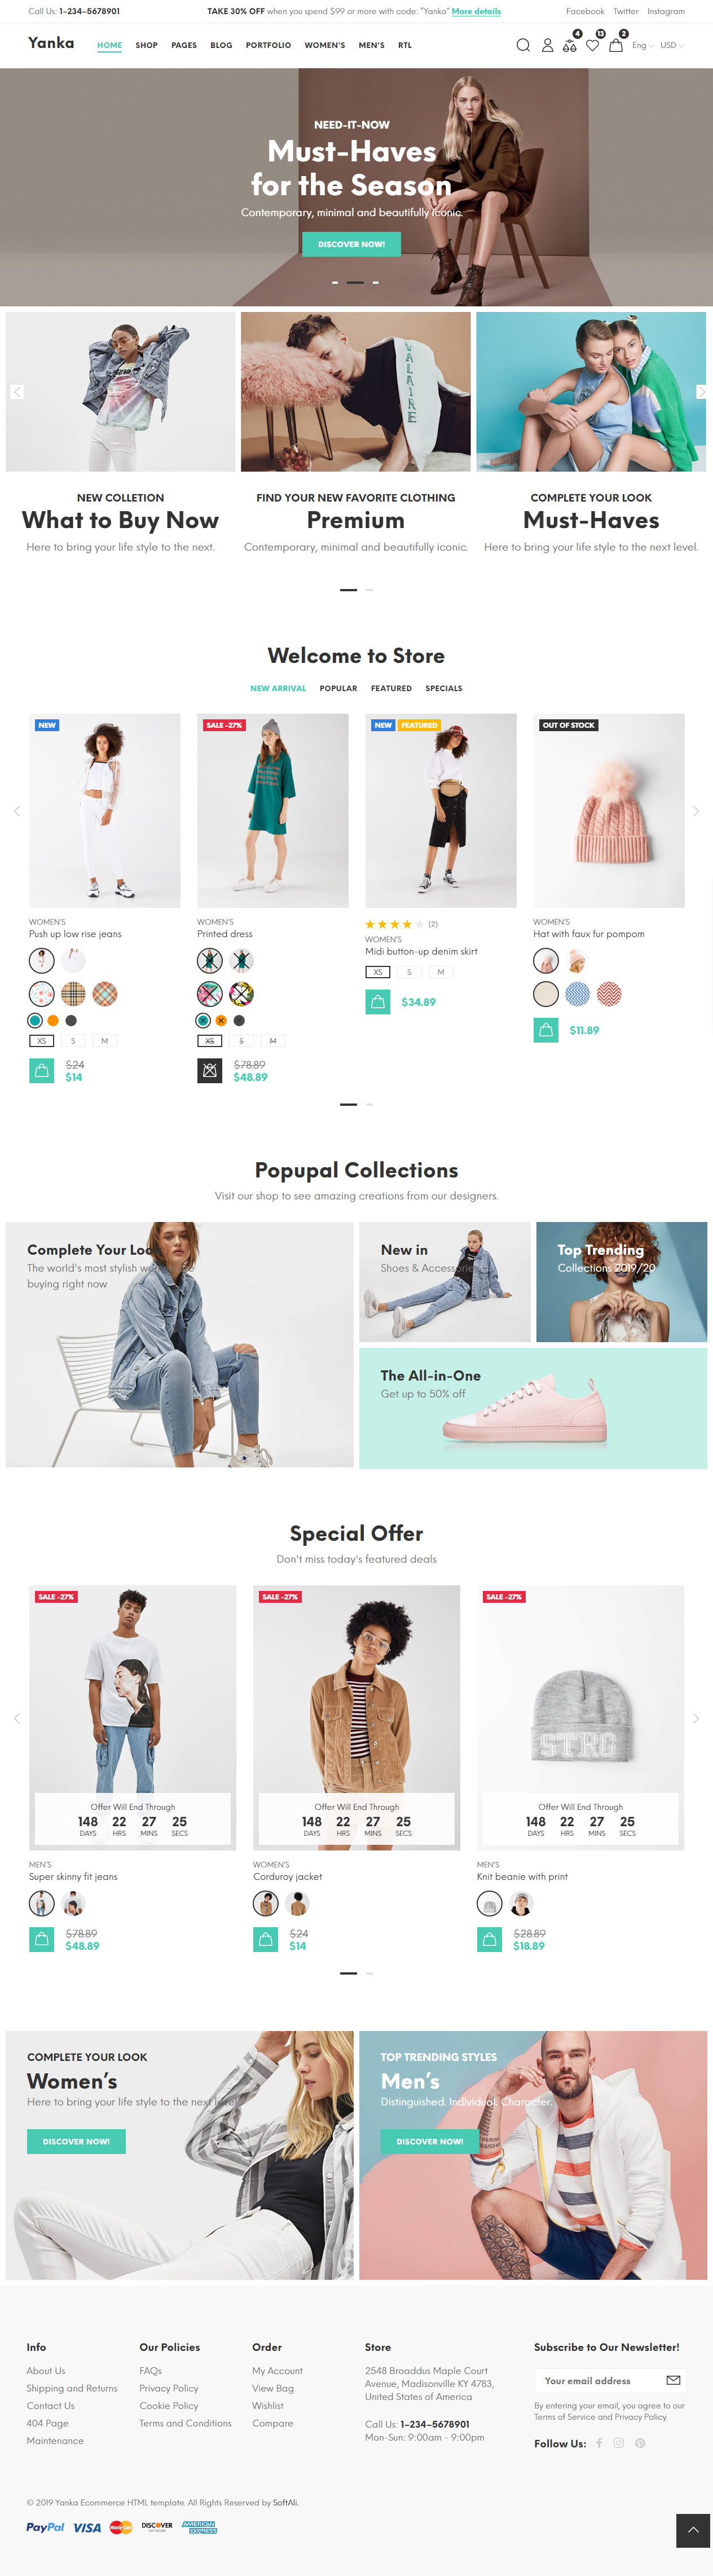 30+ Best eCommerce HTML5 Website Templates 2019 - Responsive